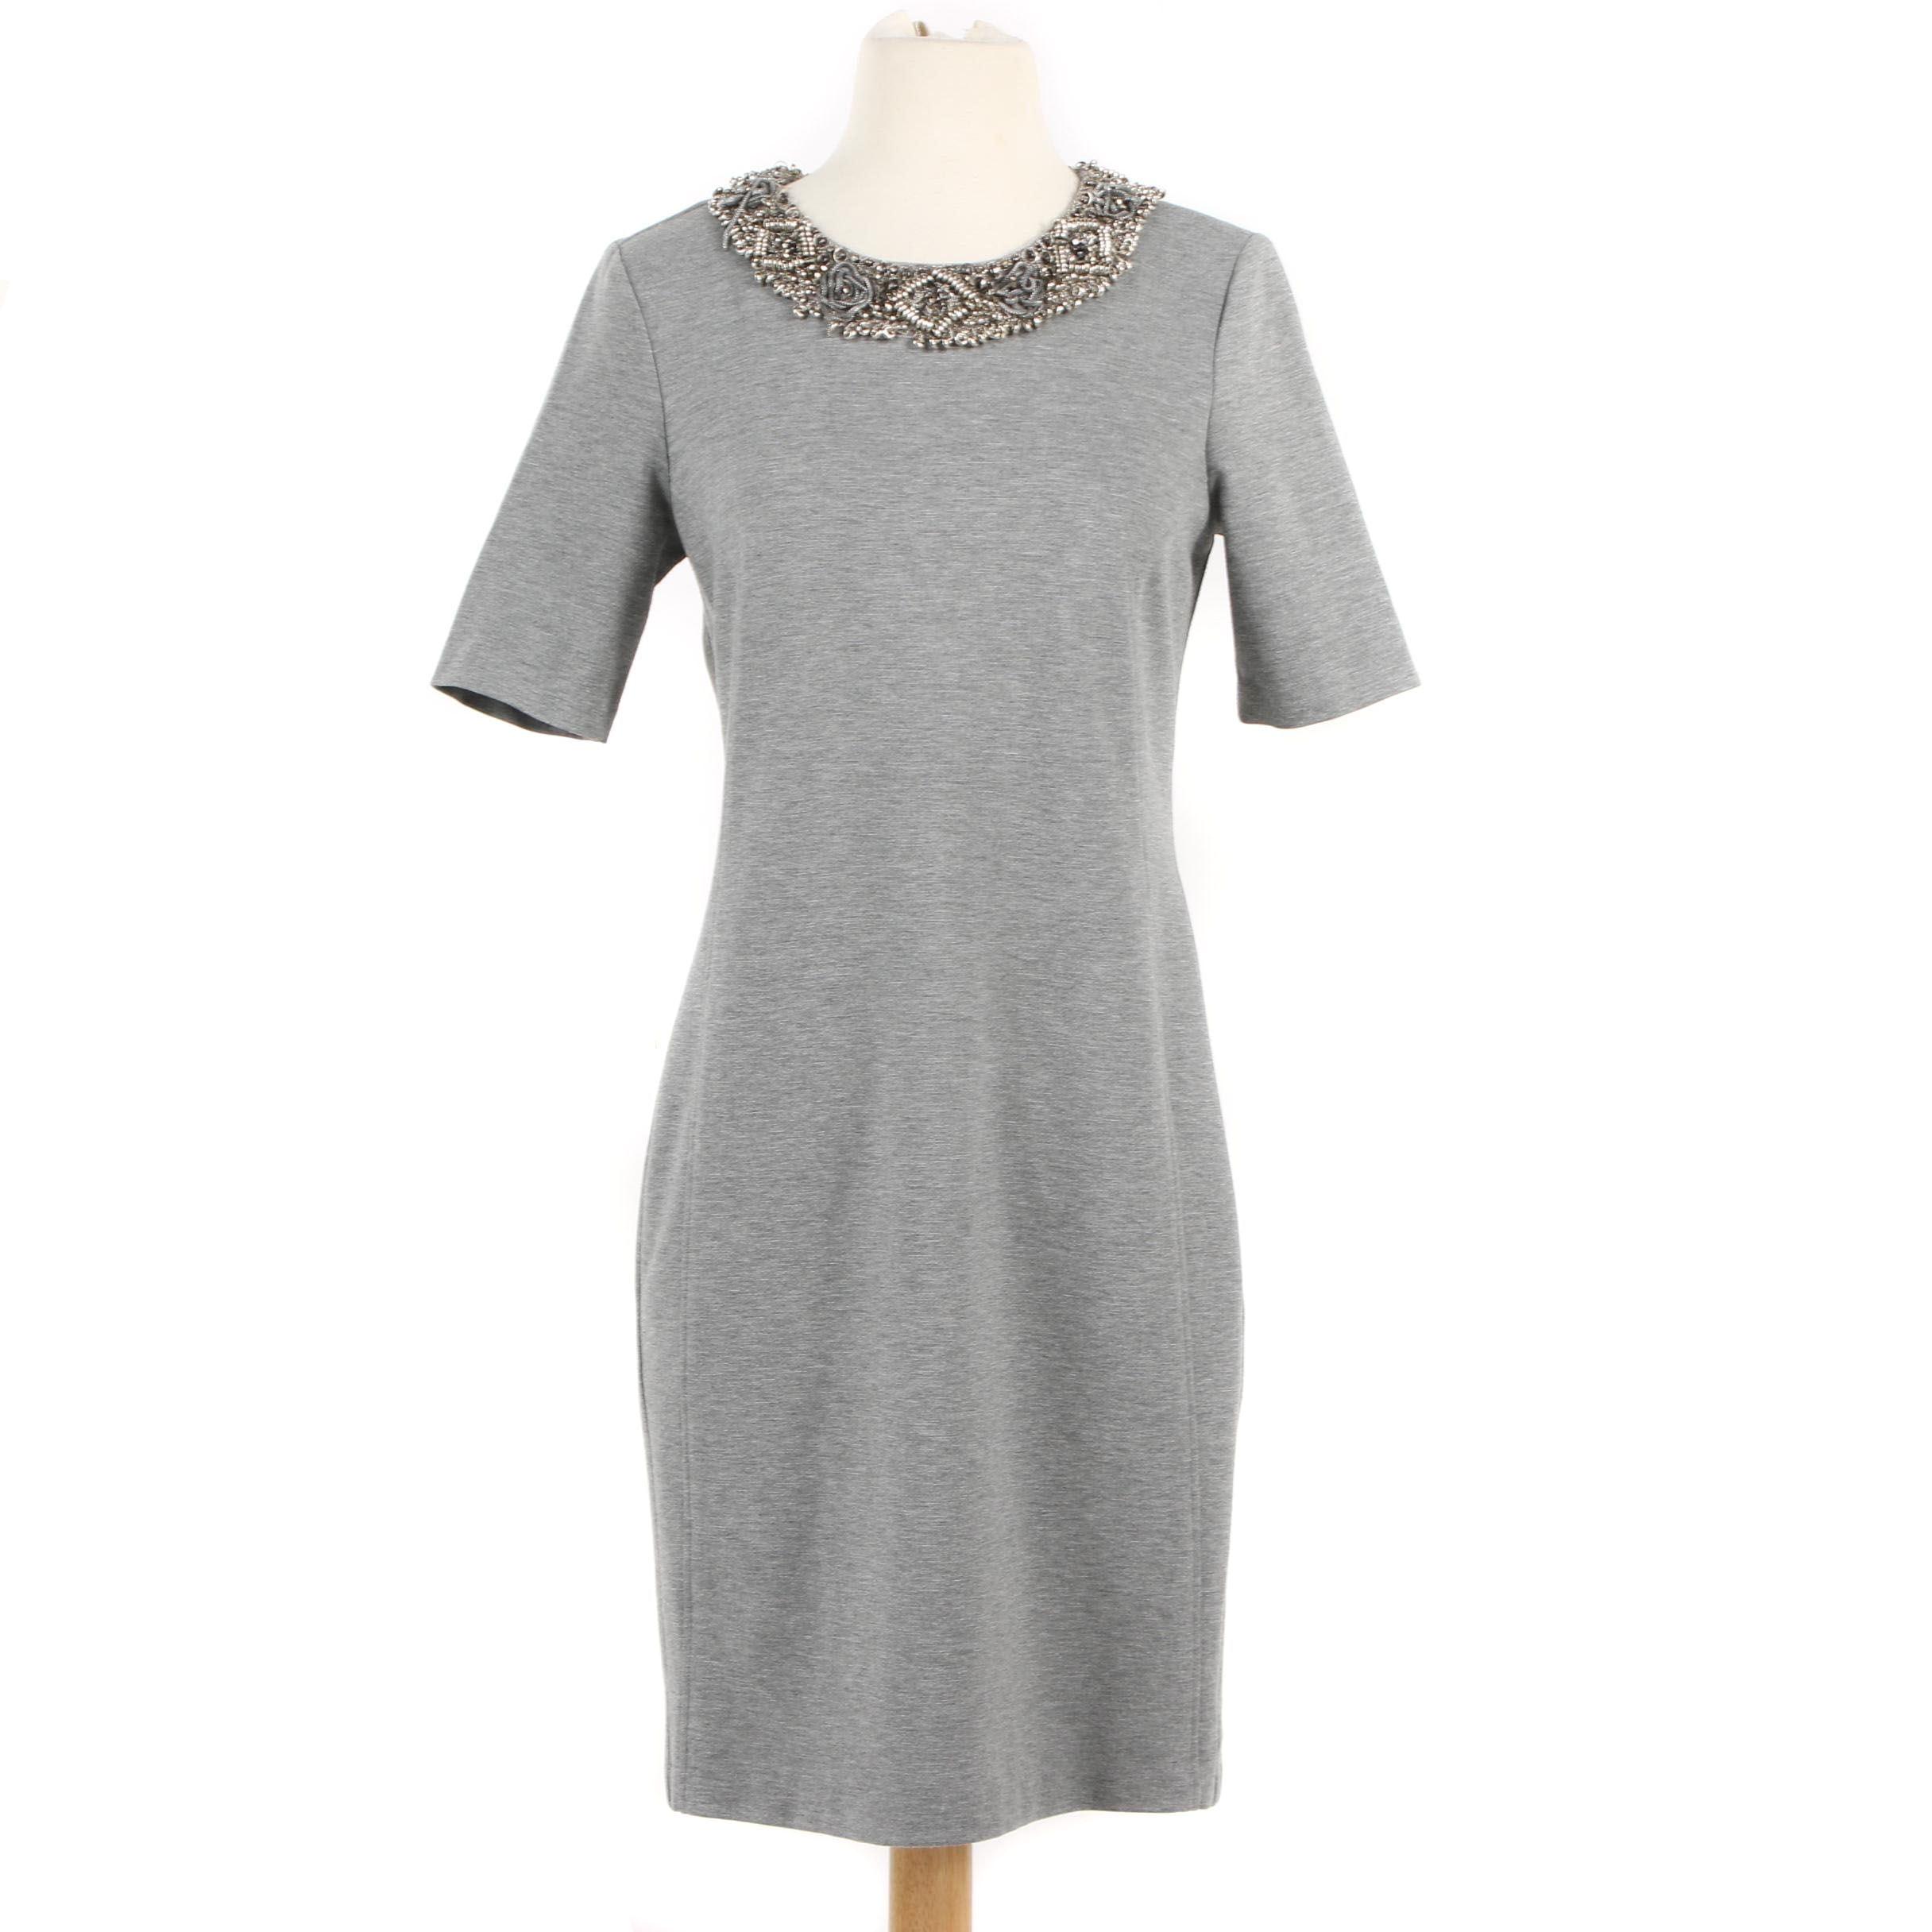 ADAM Adam Lippes Grey Shift Dress with Embellished Neckline